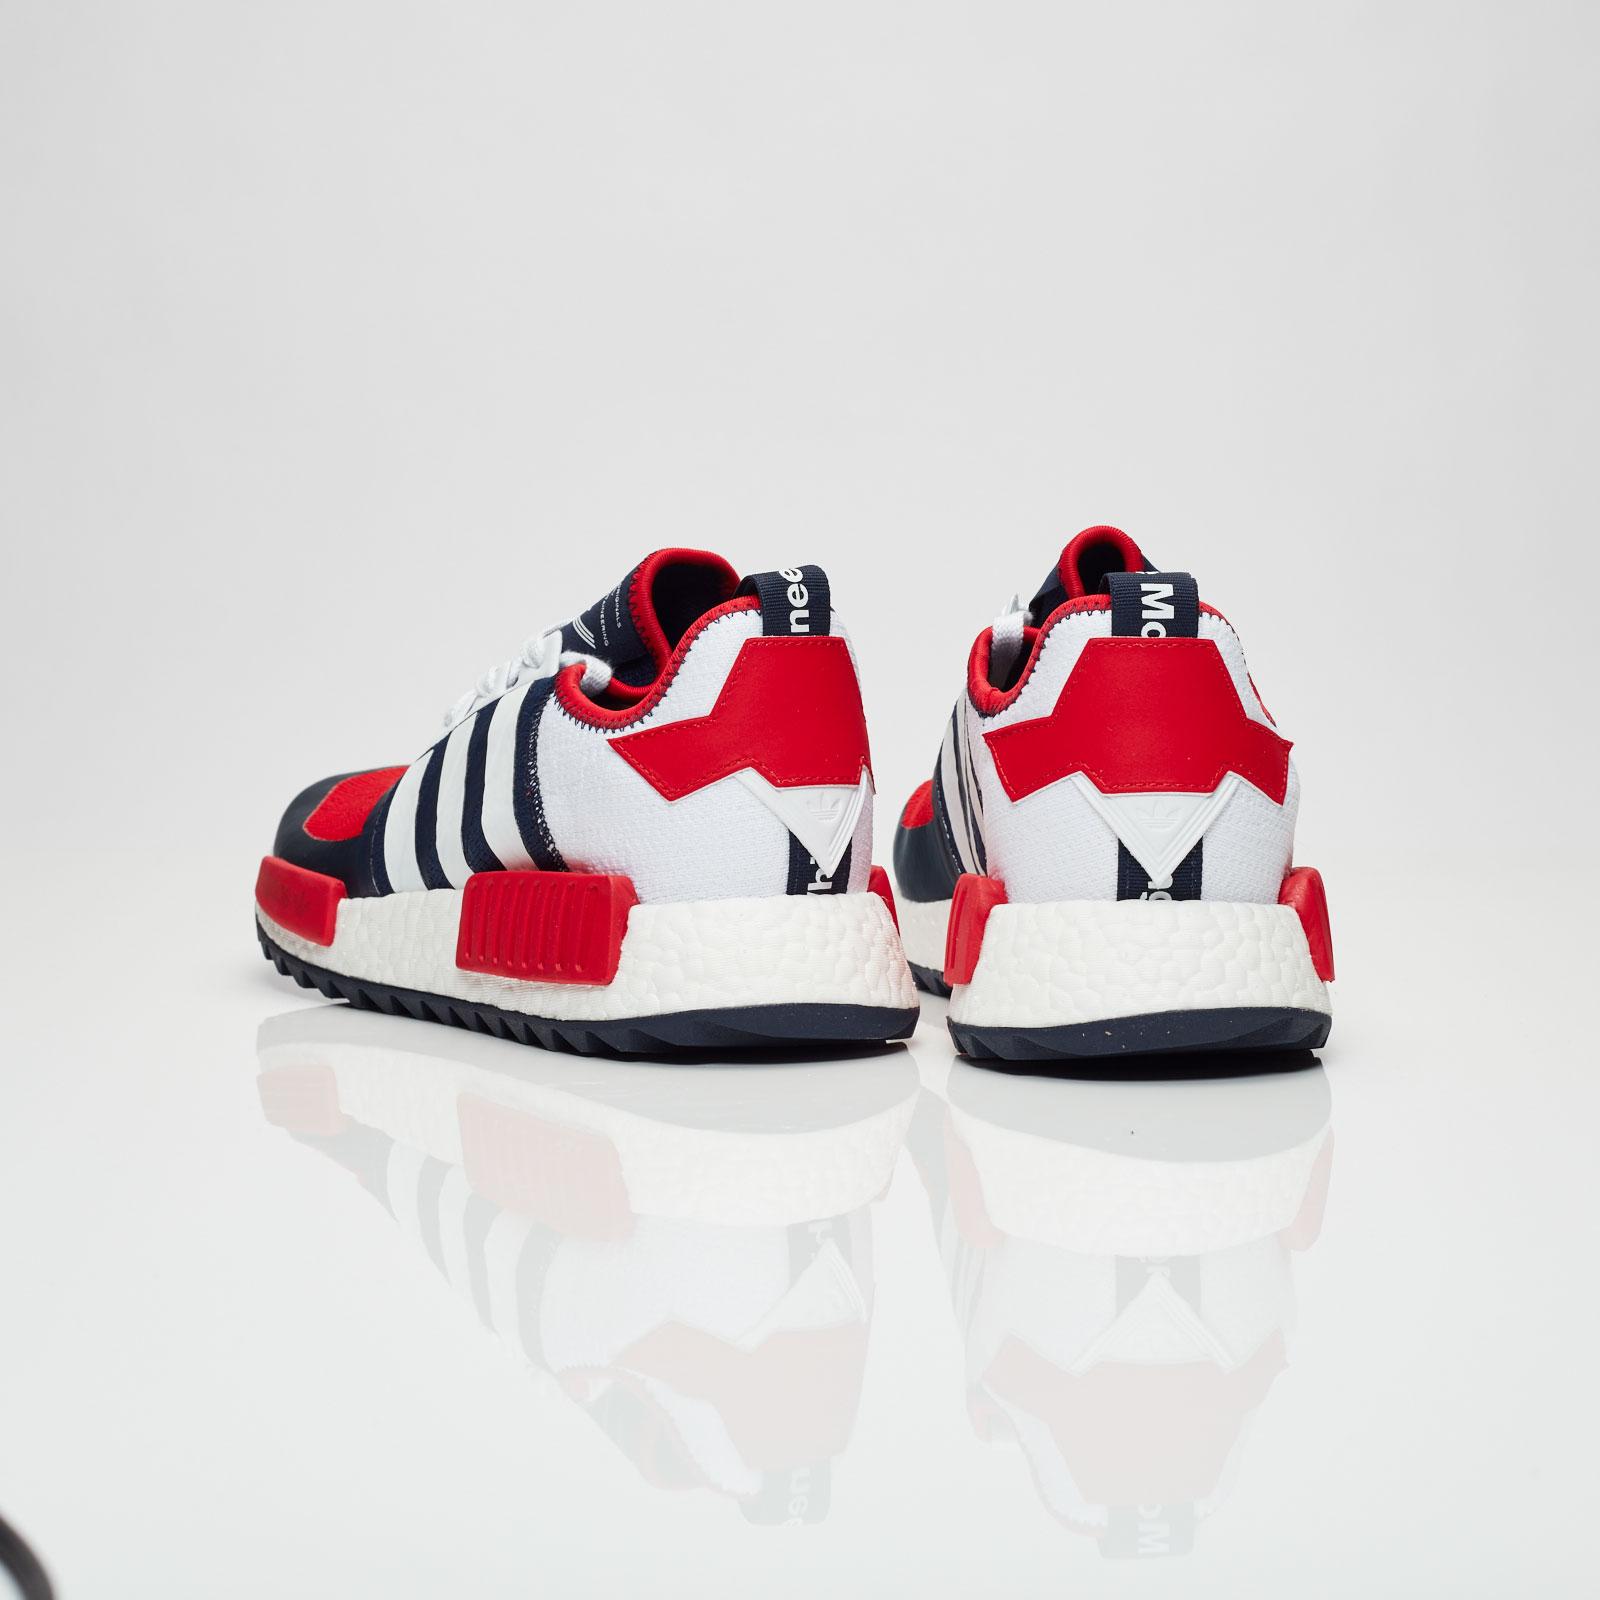 sports shoes 60b2b fae9a adidas Wm Nmd Trail Pk - Ba7519 - Sneakersnstuff | sneakers ...